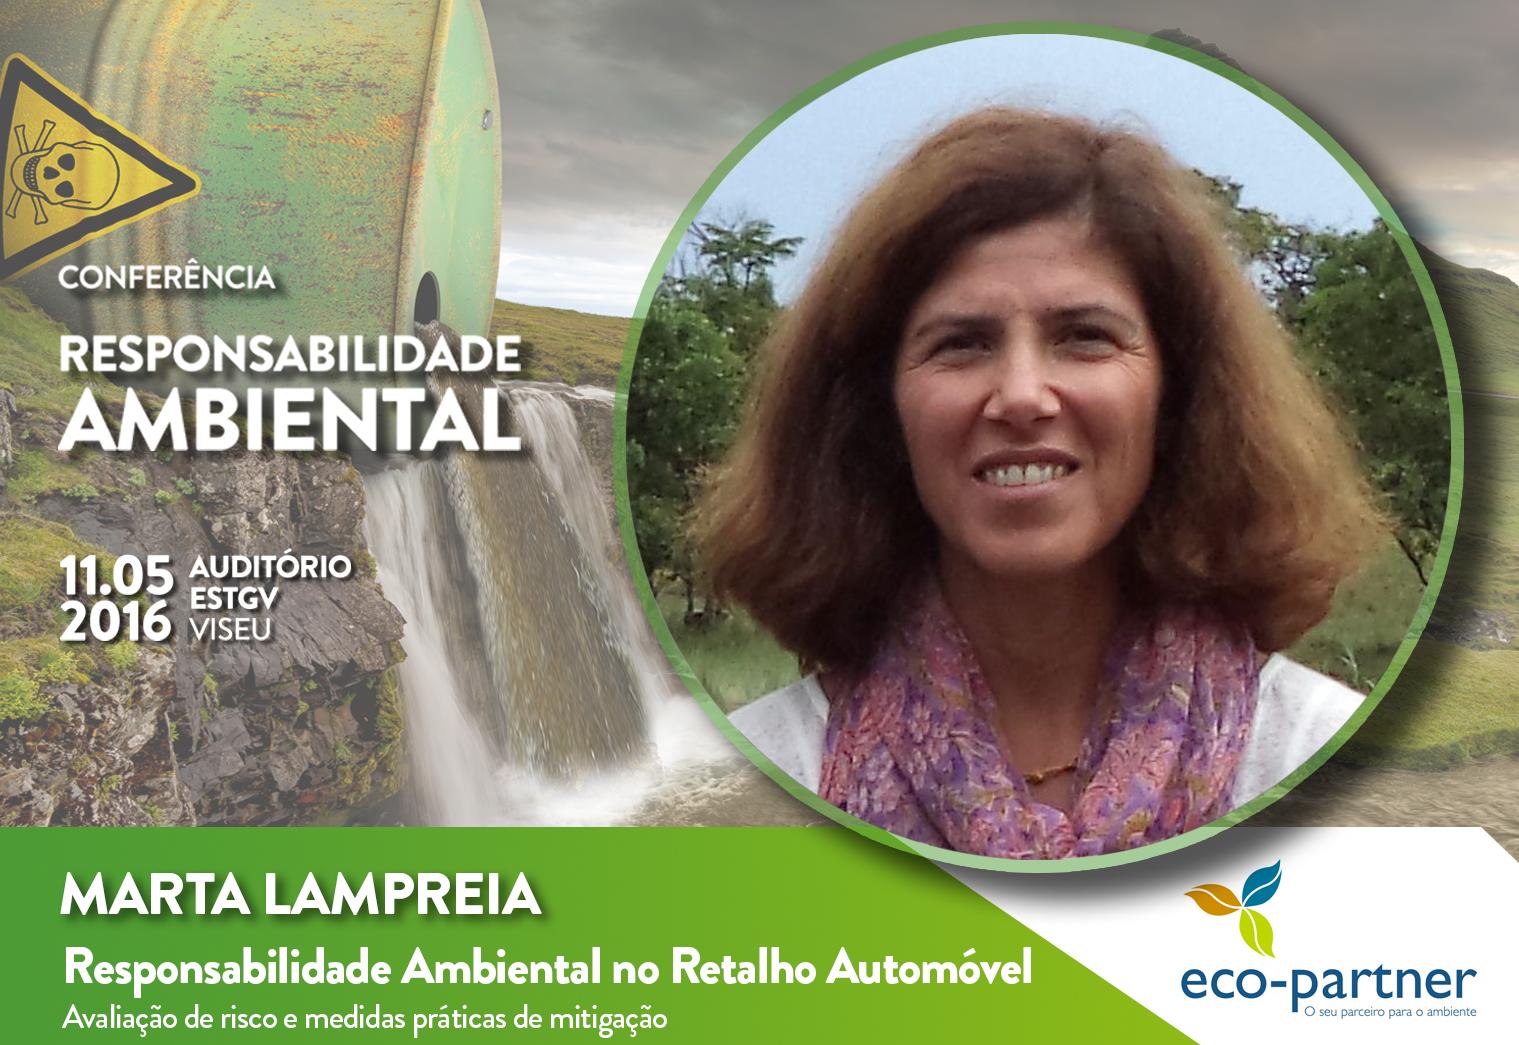 Marta Lampreia conferência responsabilidade ambiental